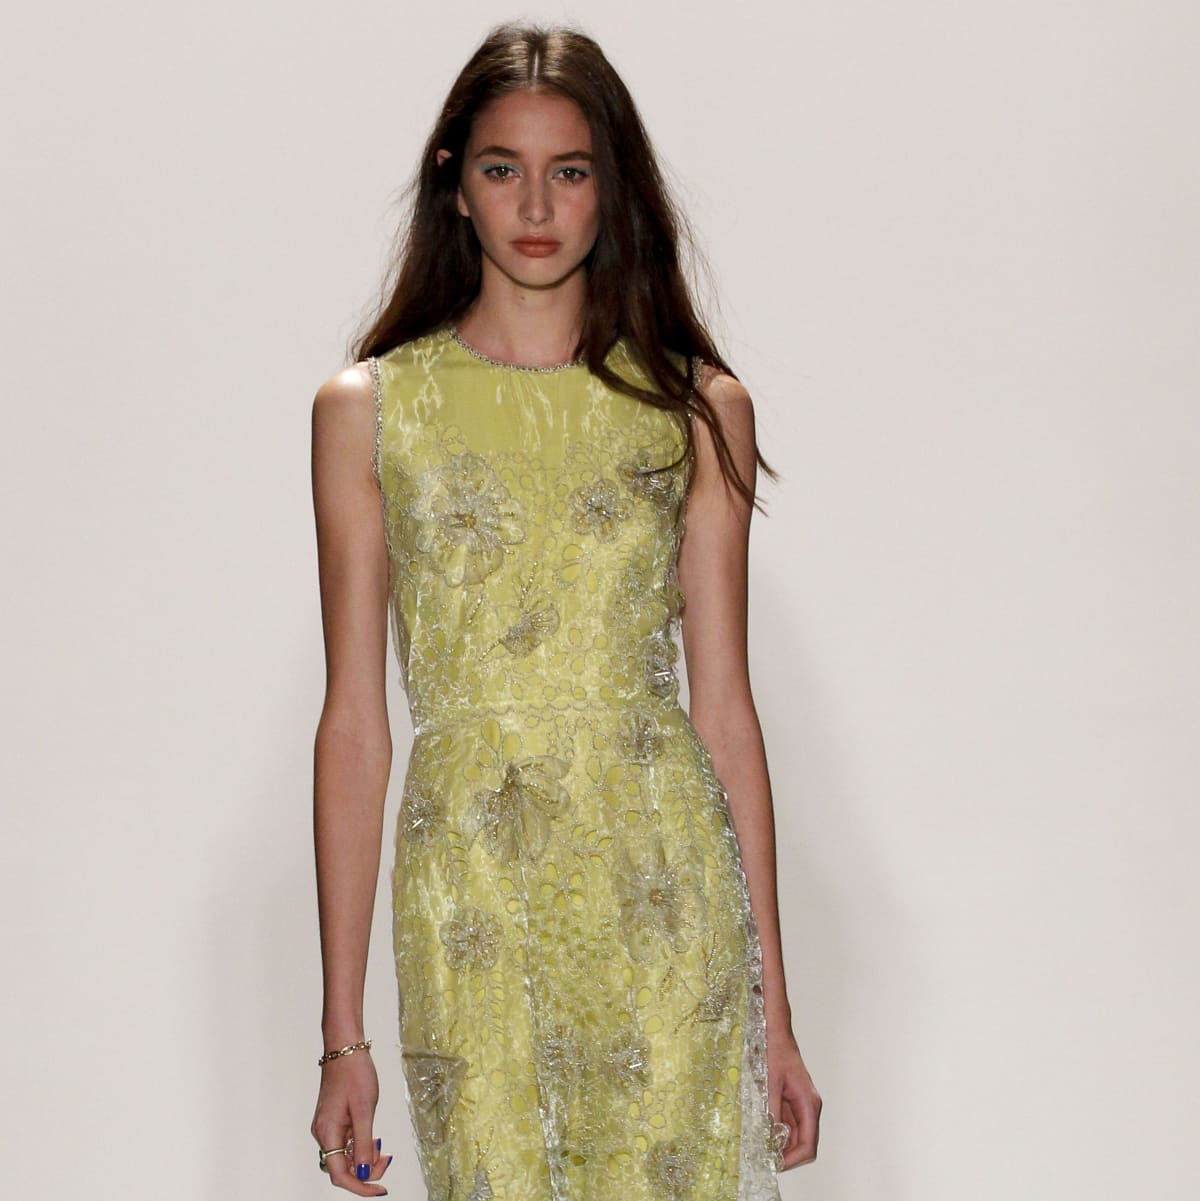 Jenny Packham spring 2016 look 7